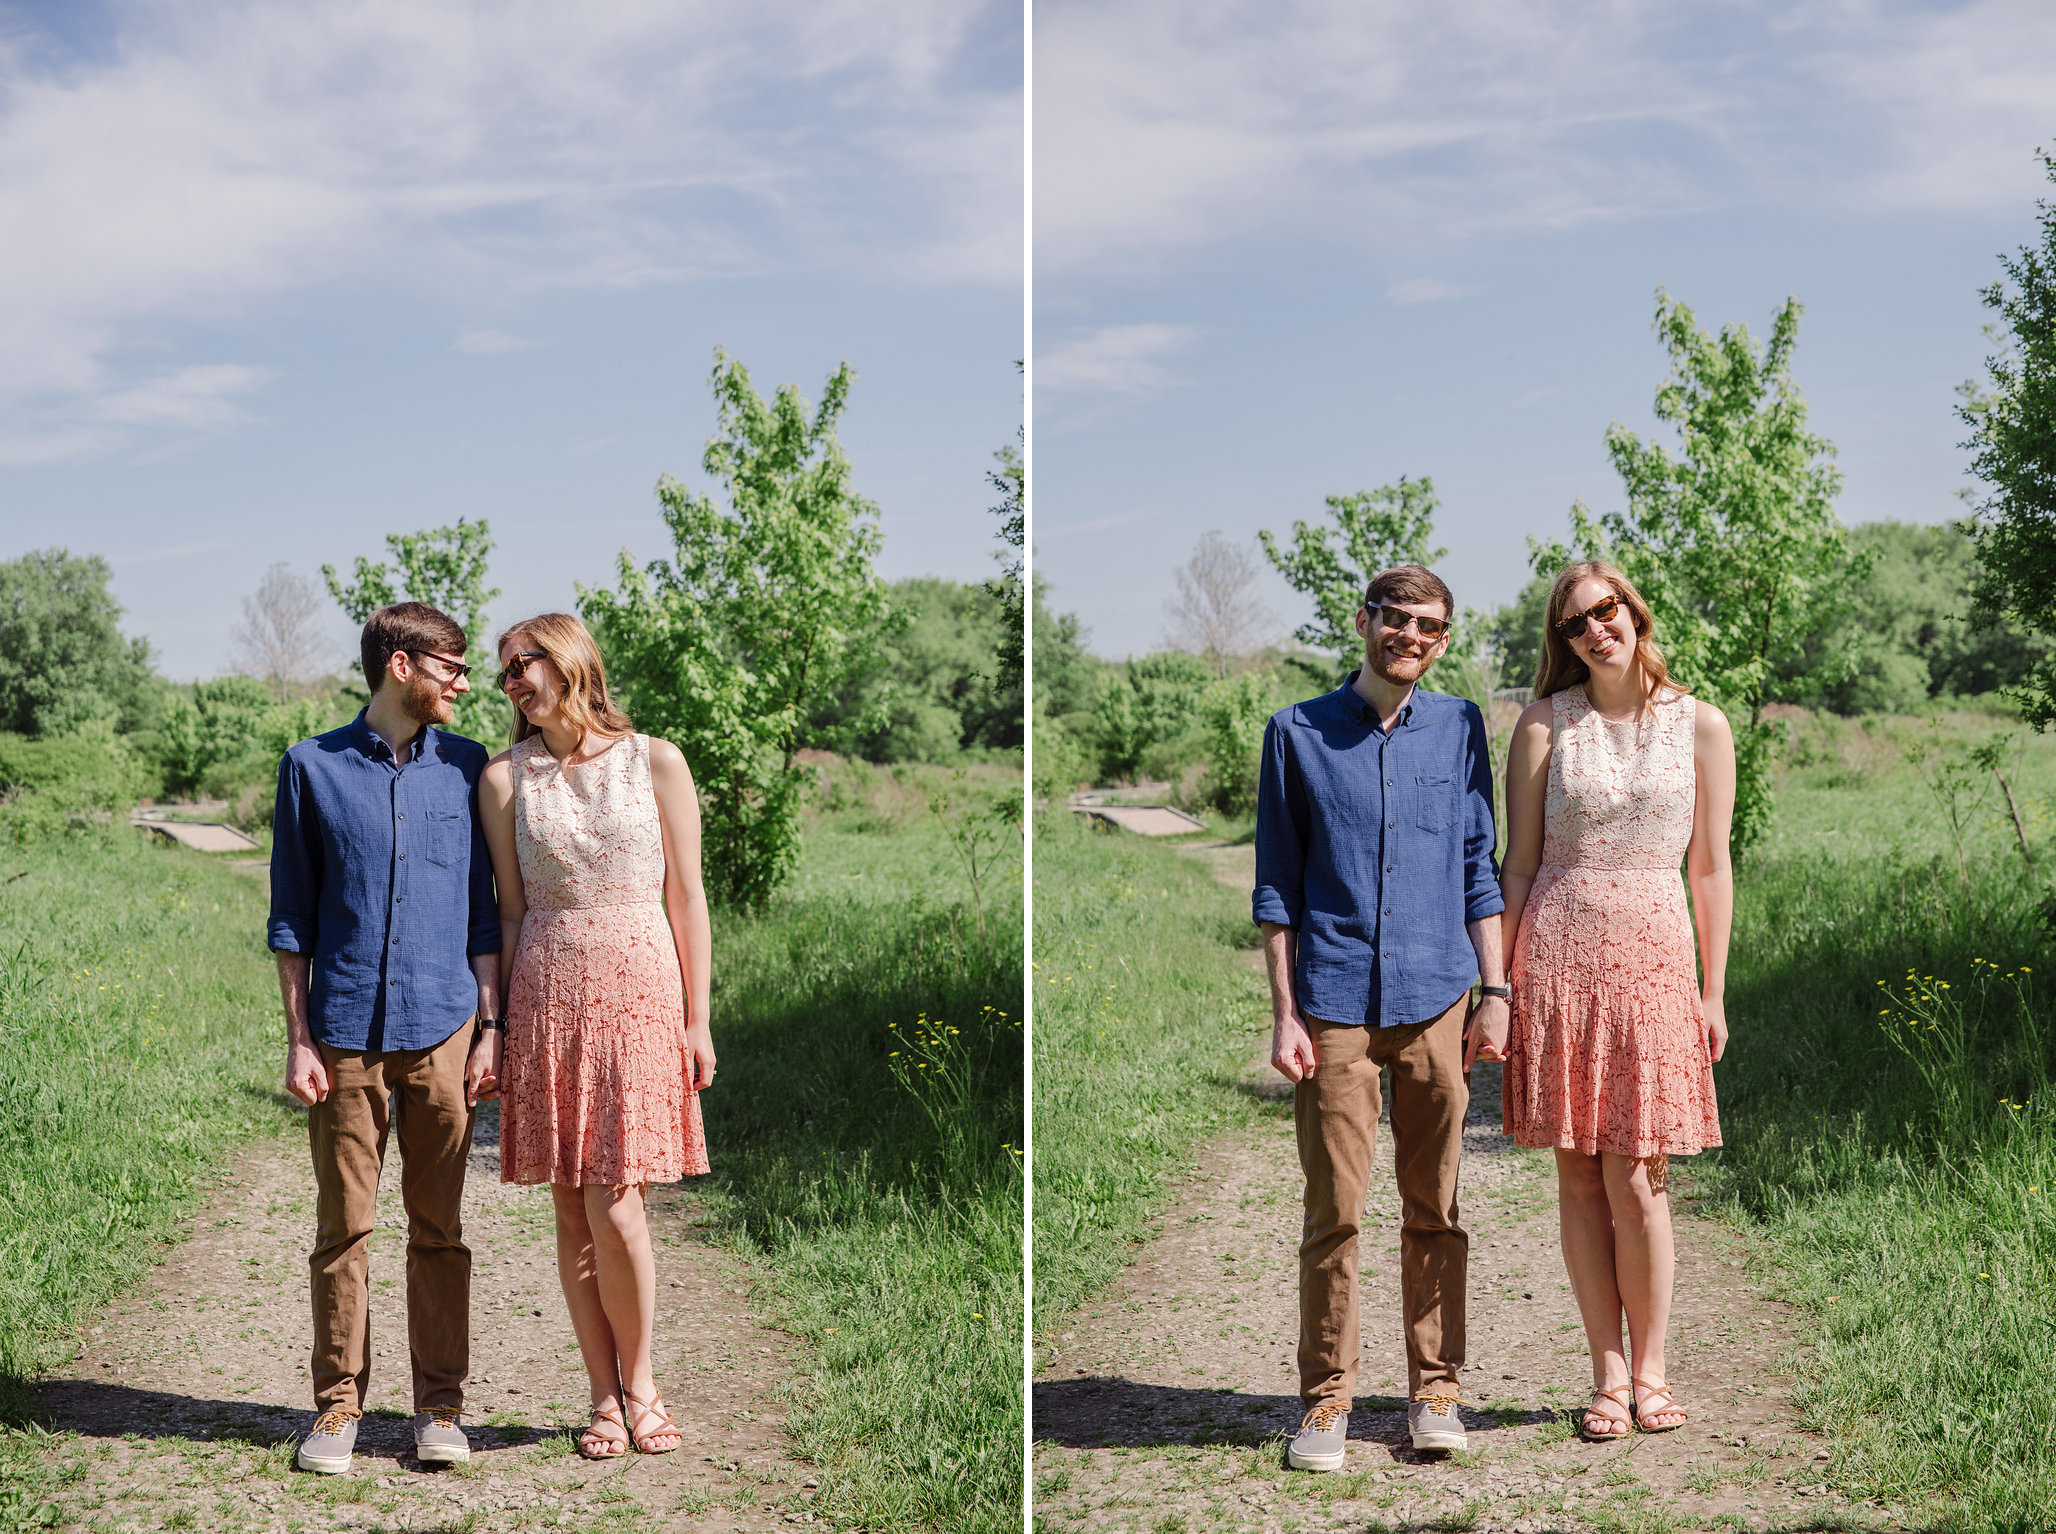 Chelsea+James-Appalachian Trail Engagement Session-Sunglasses-New Jersey- Olivia Christina Photo.jpg